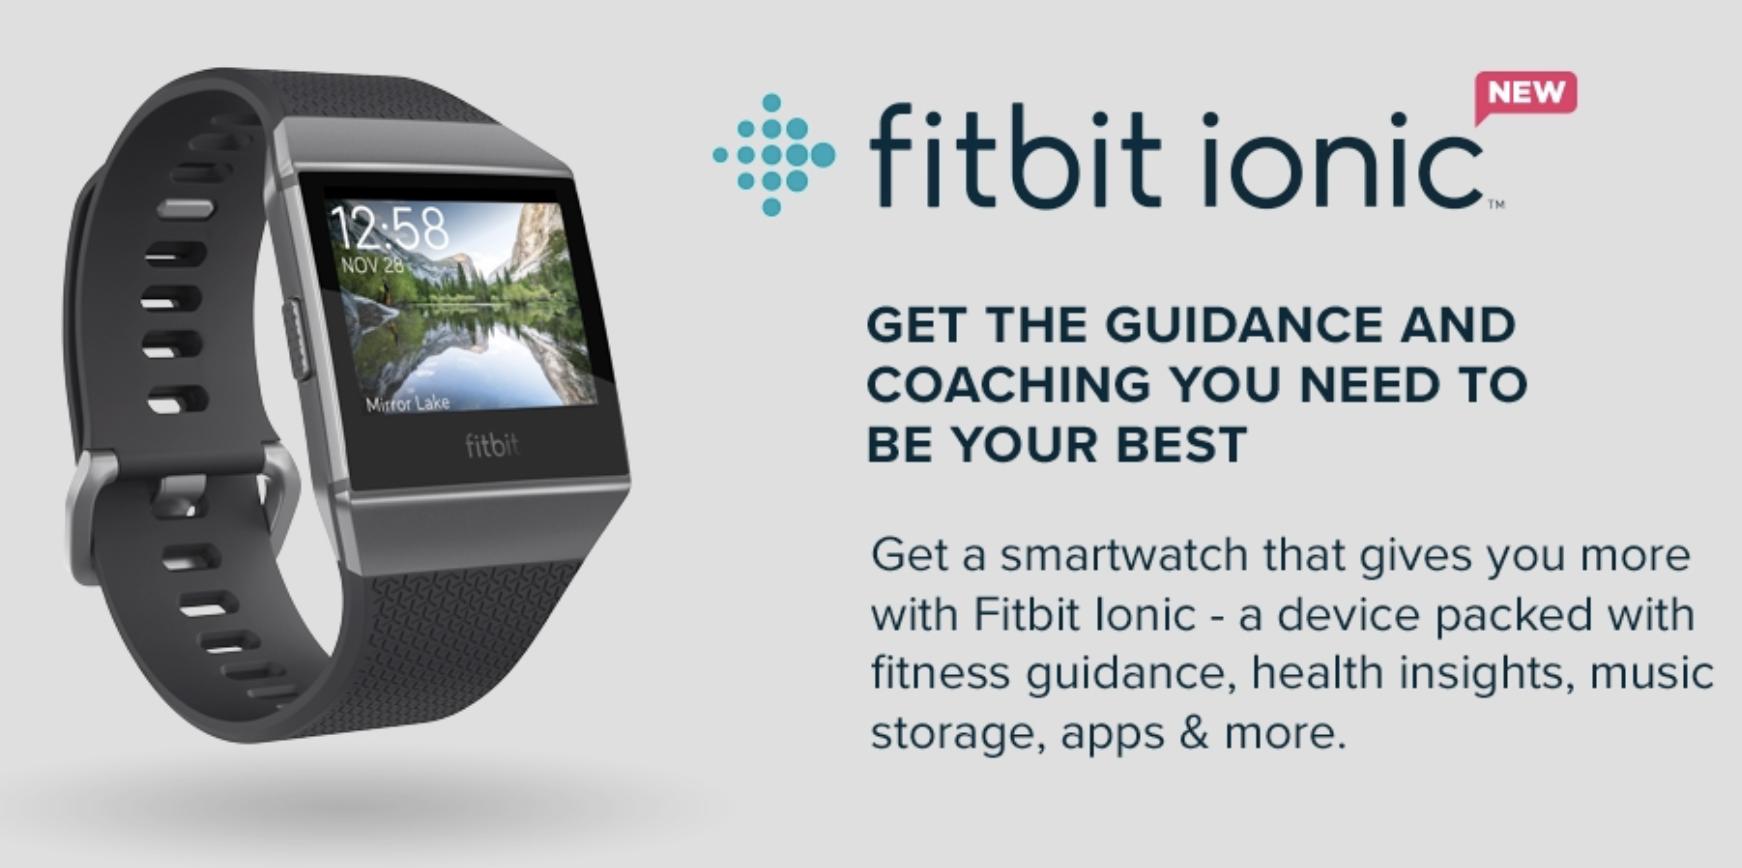 Fitbit Uniionic Smartwatch Start Dynamic Personal